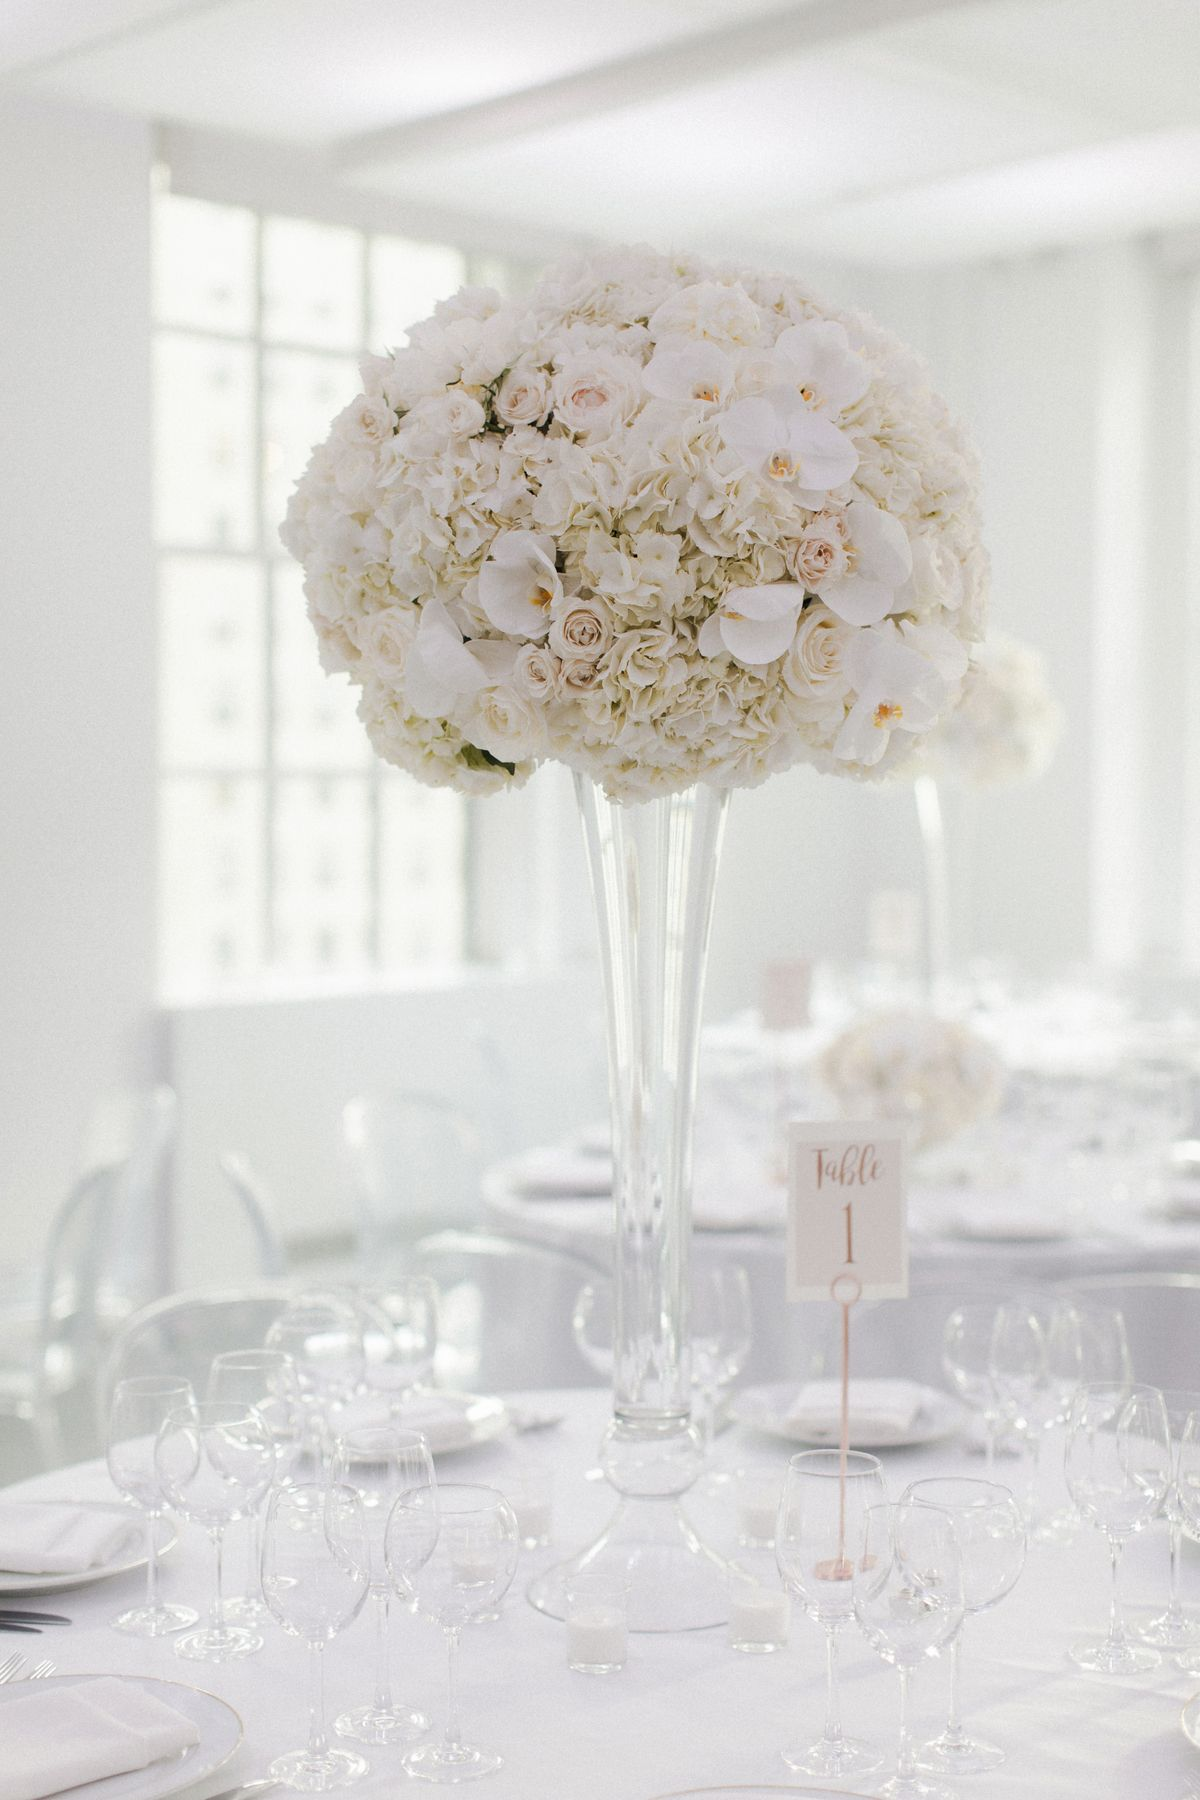 Carats & Cake – Alice & Chris at 620 Loft & Garden | Bride & Blossom